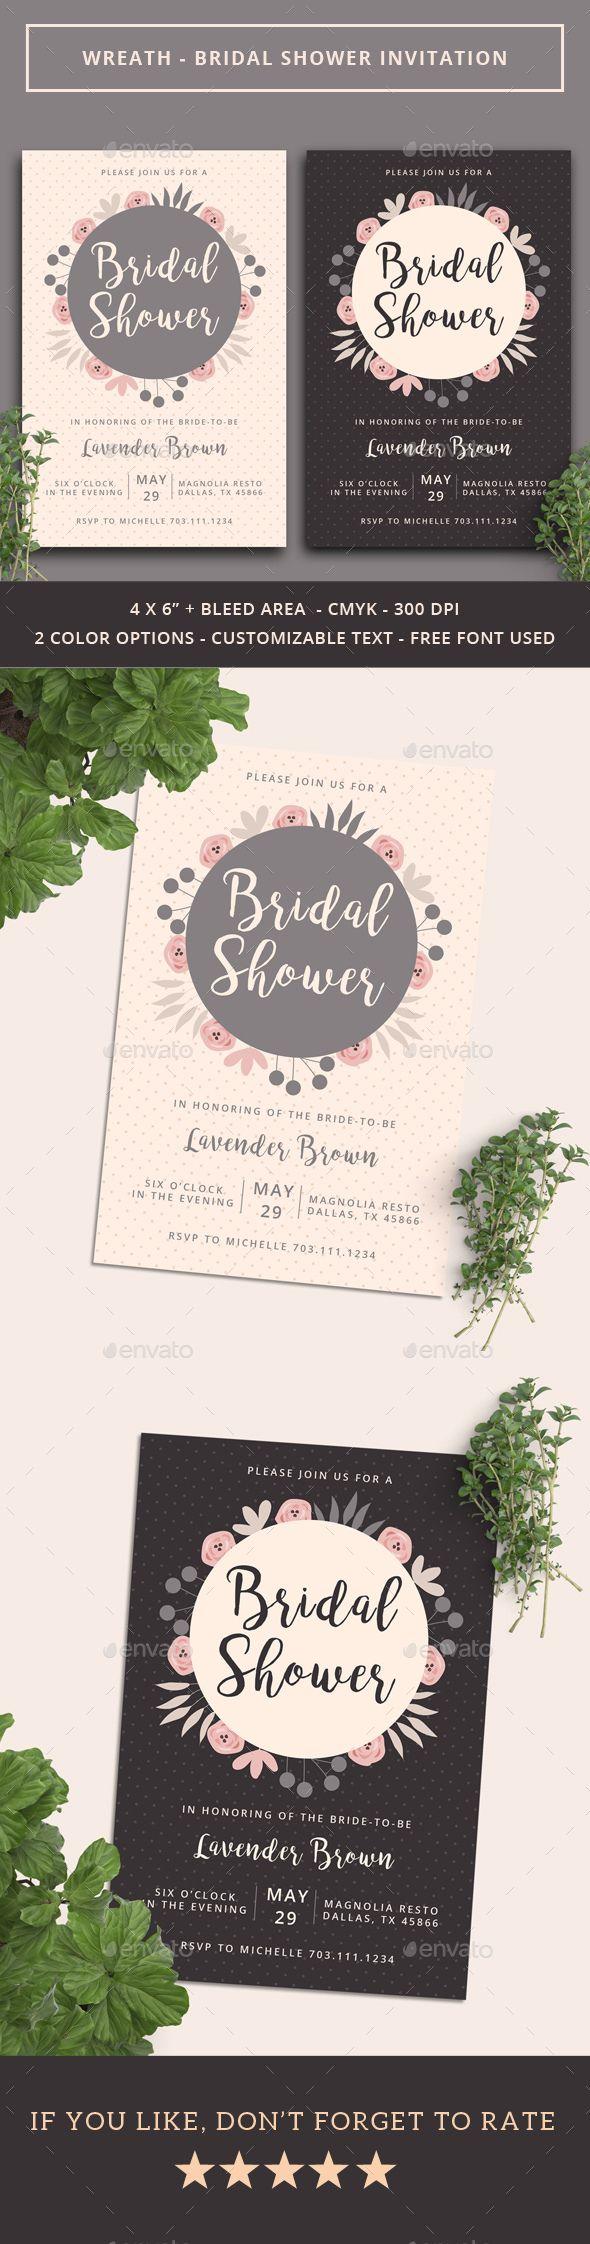 Wreath Bridal Shower Invitation u2014 Photoshop PSD